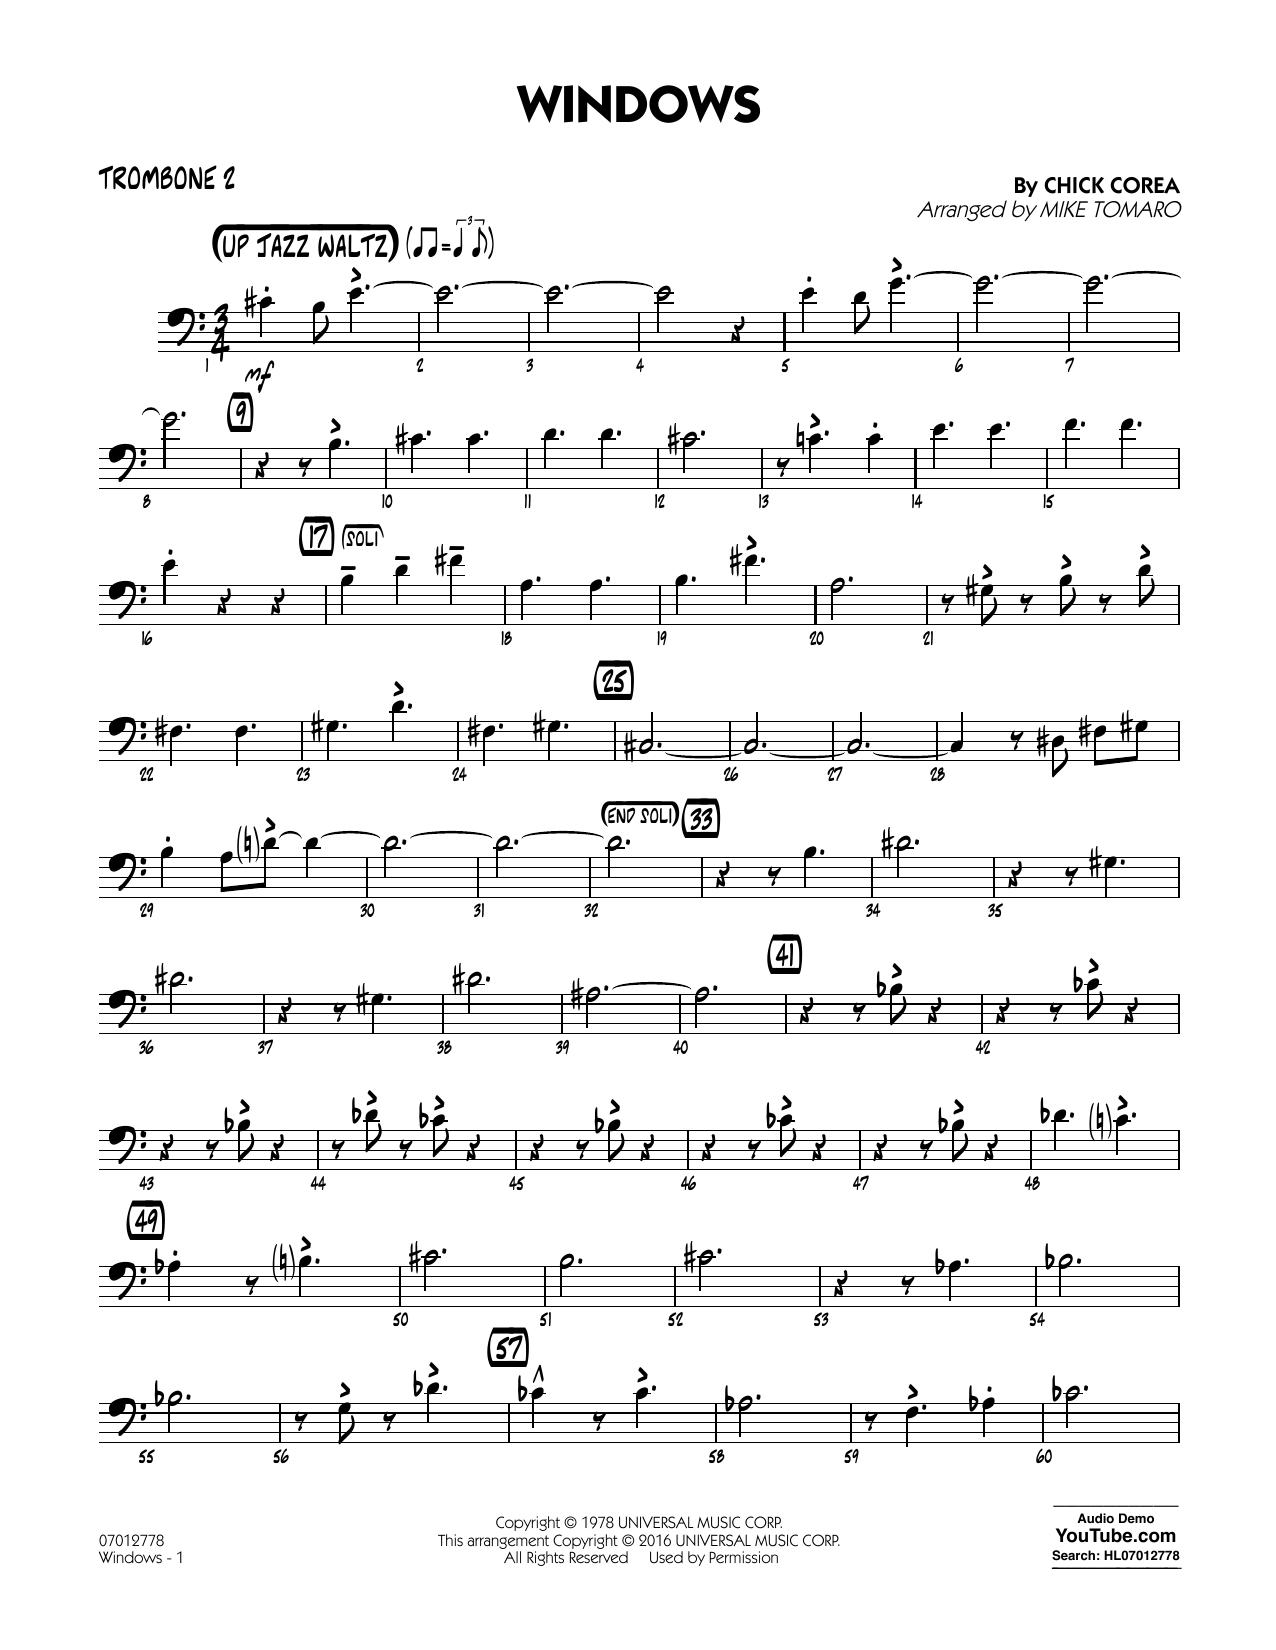 Chick Corea Elektric Band - Windows - Trombone 2